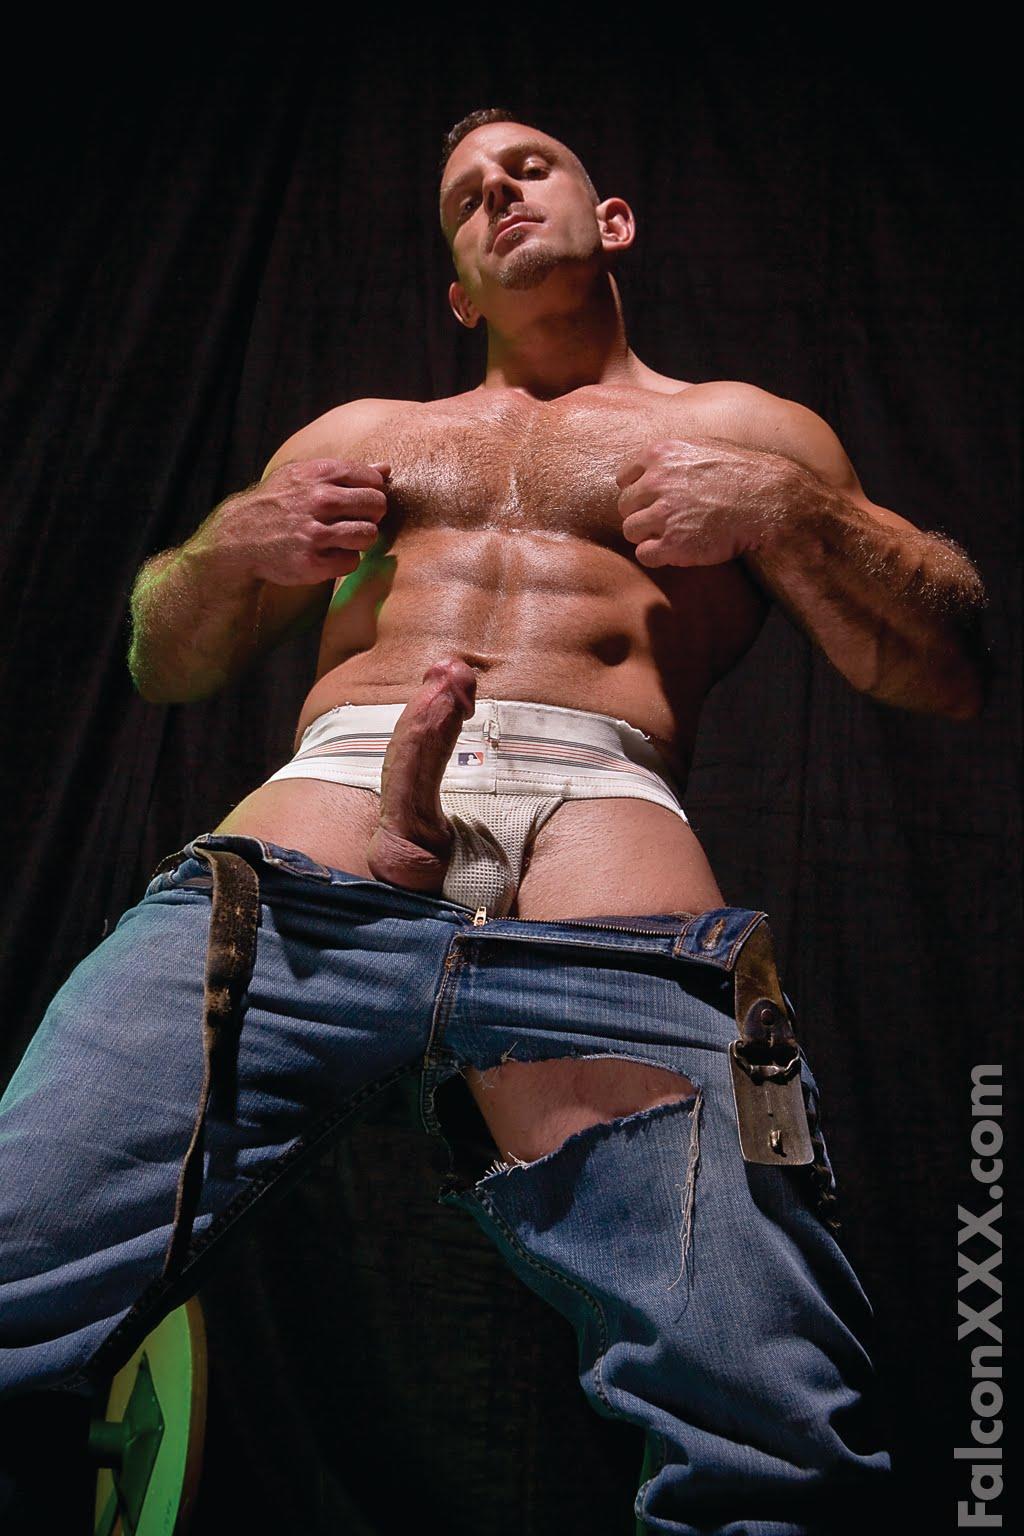 powerman priest gay porn